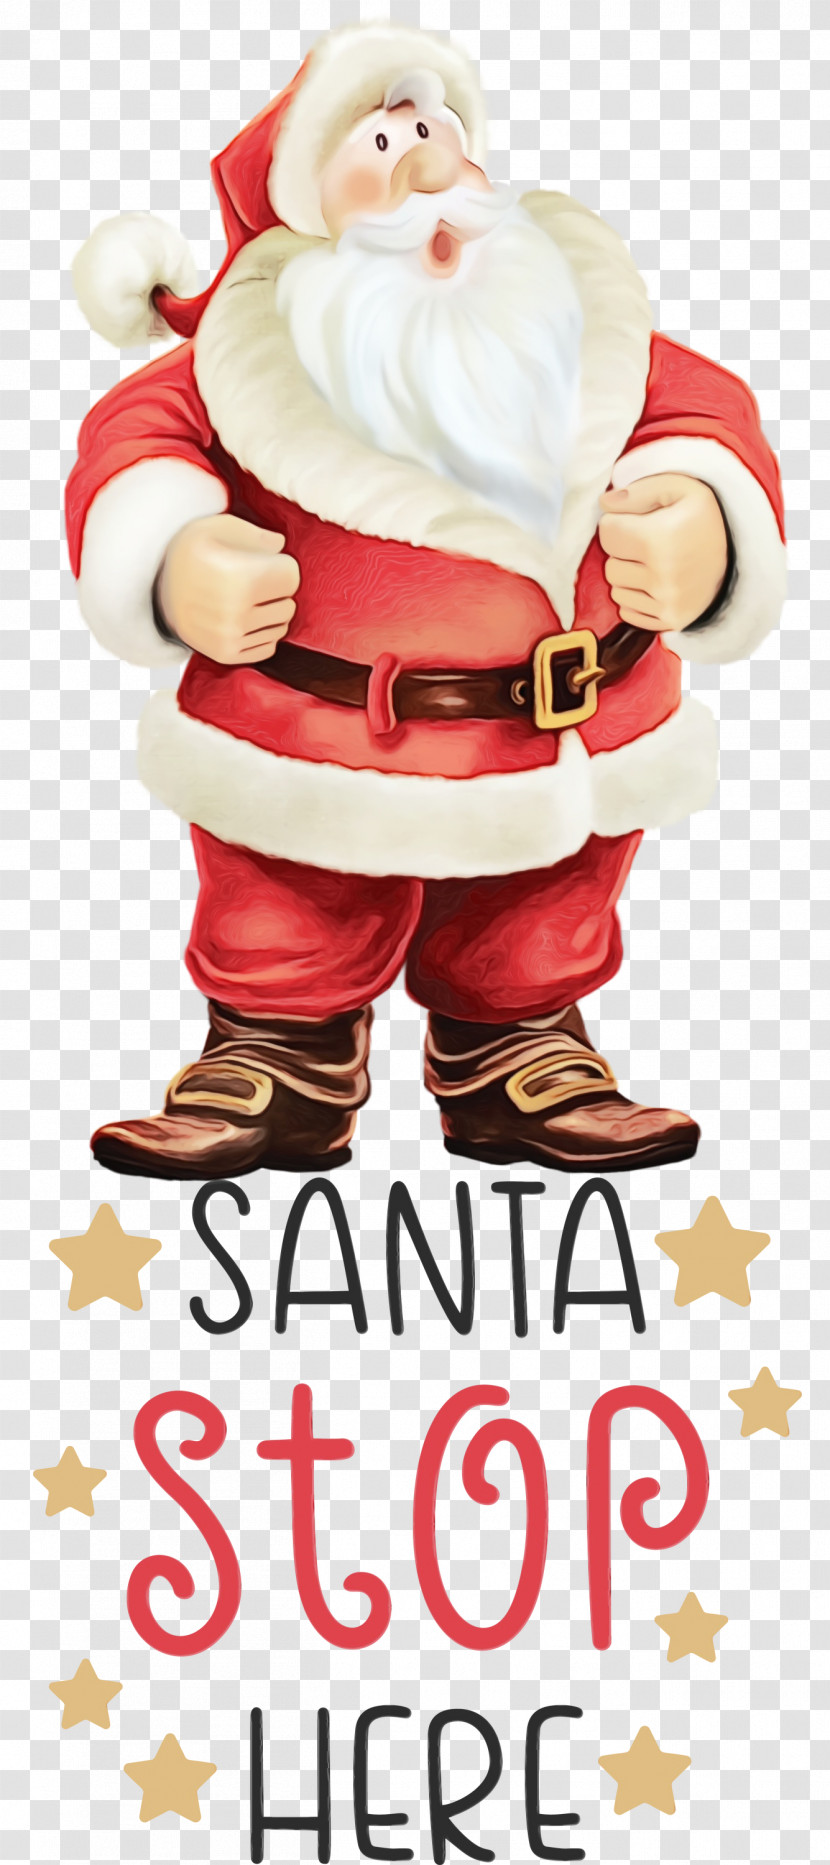 Santa Claus Transparent PNG